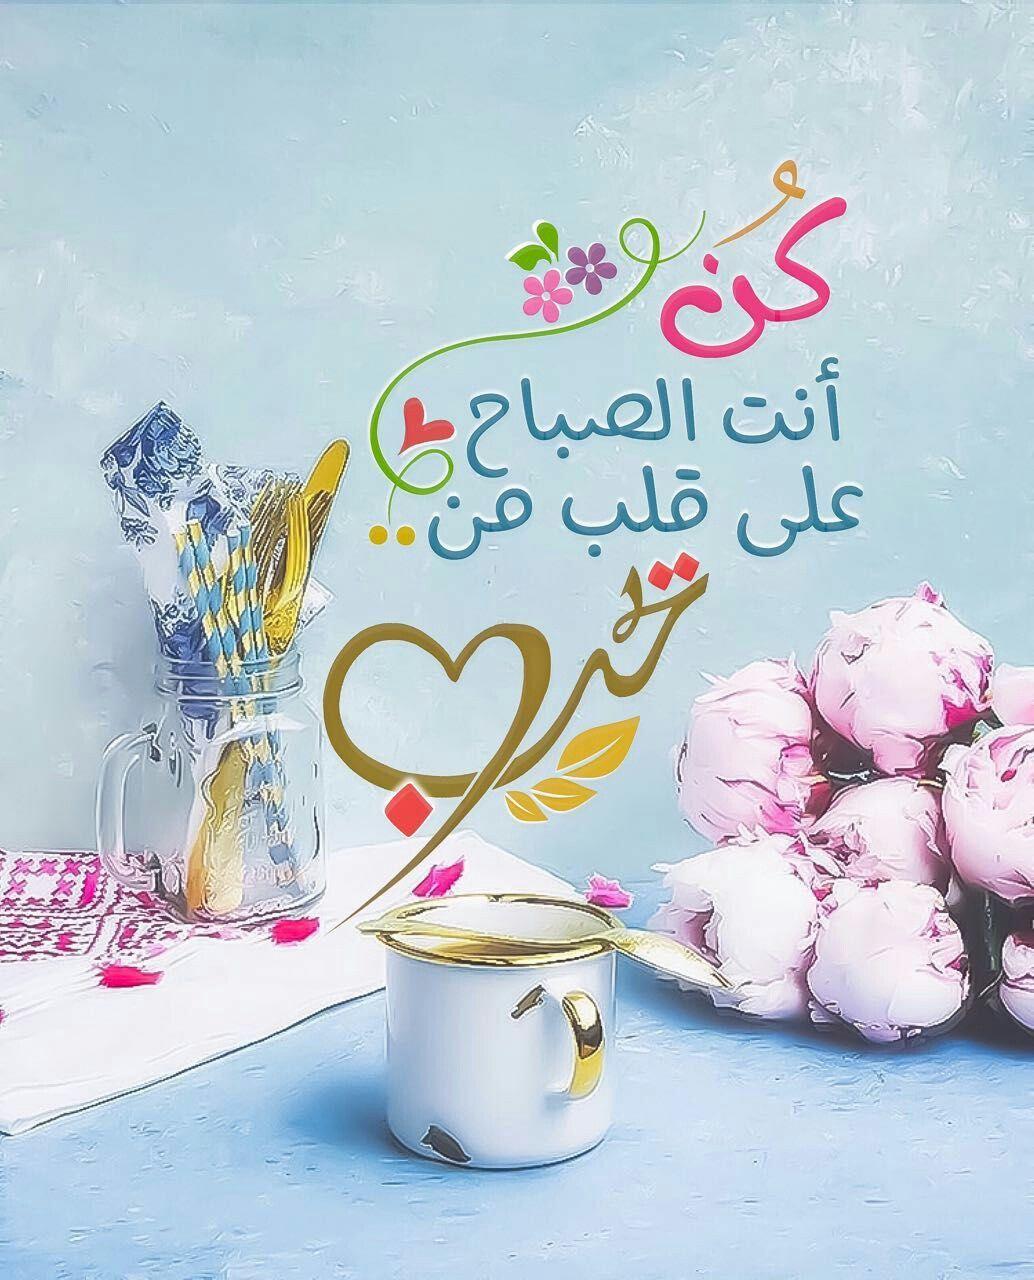 Pin By Razan Alabdeh On صباح ومساء Good Morning Arabic Morning Greeting Ramadan Cards